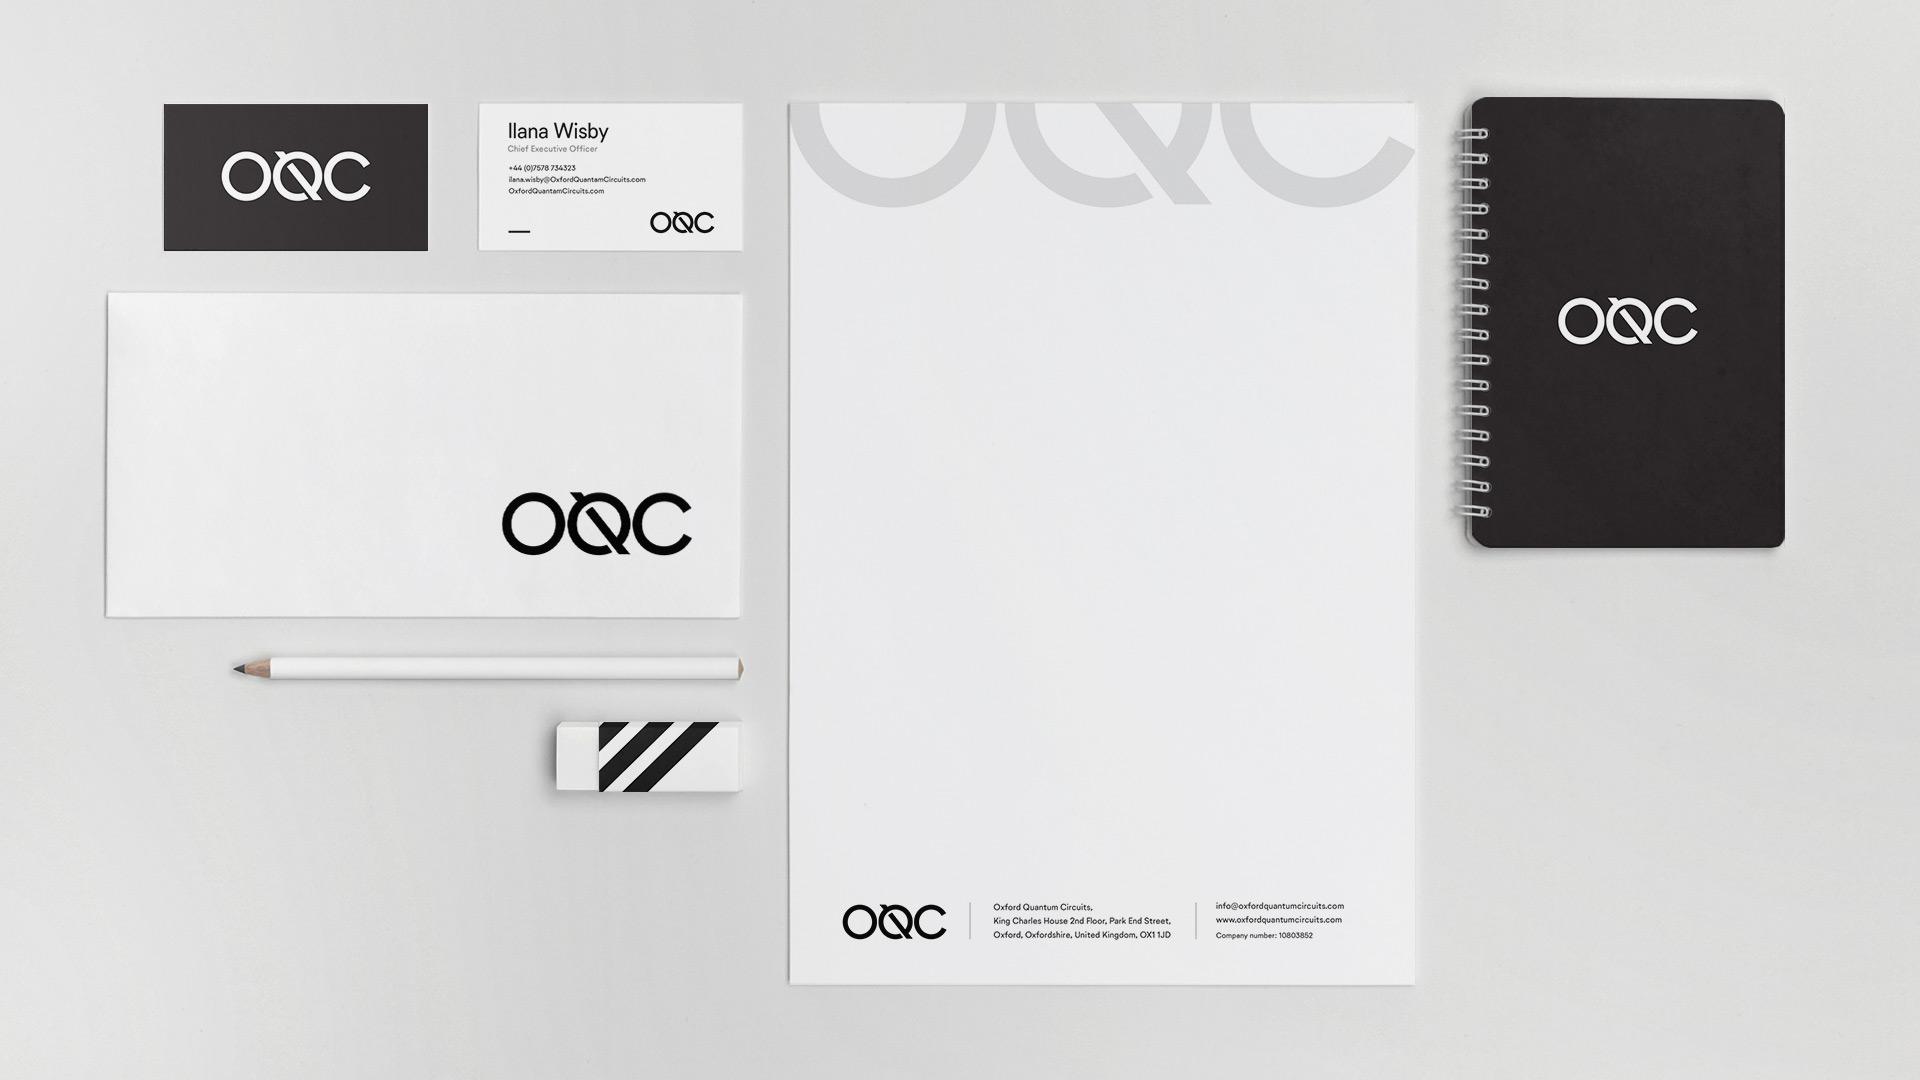 OQC_img_2